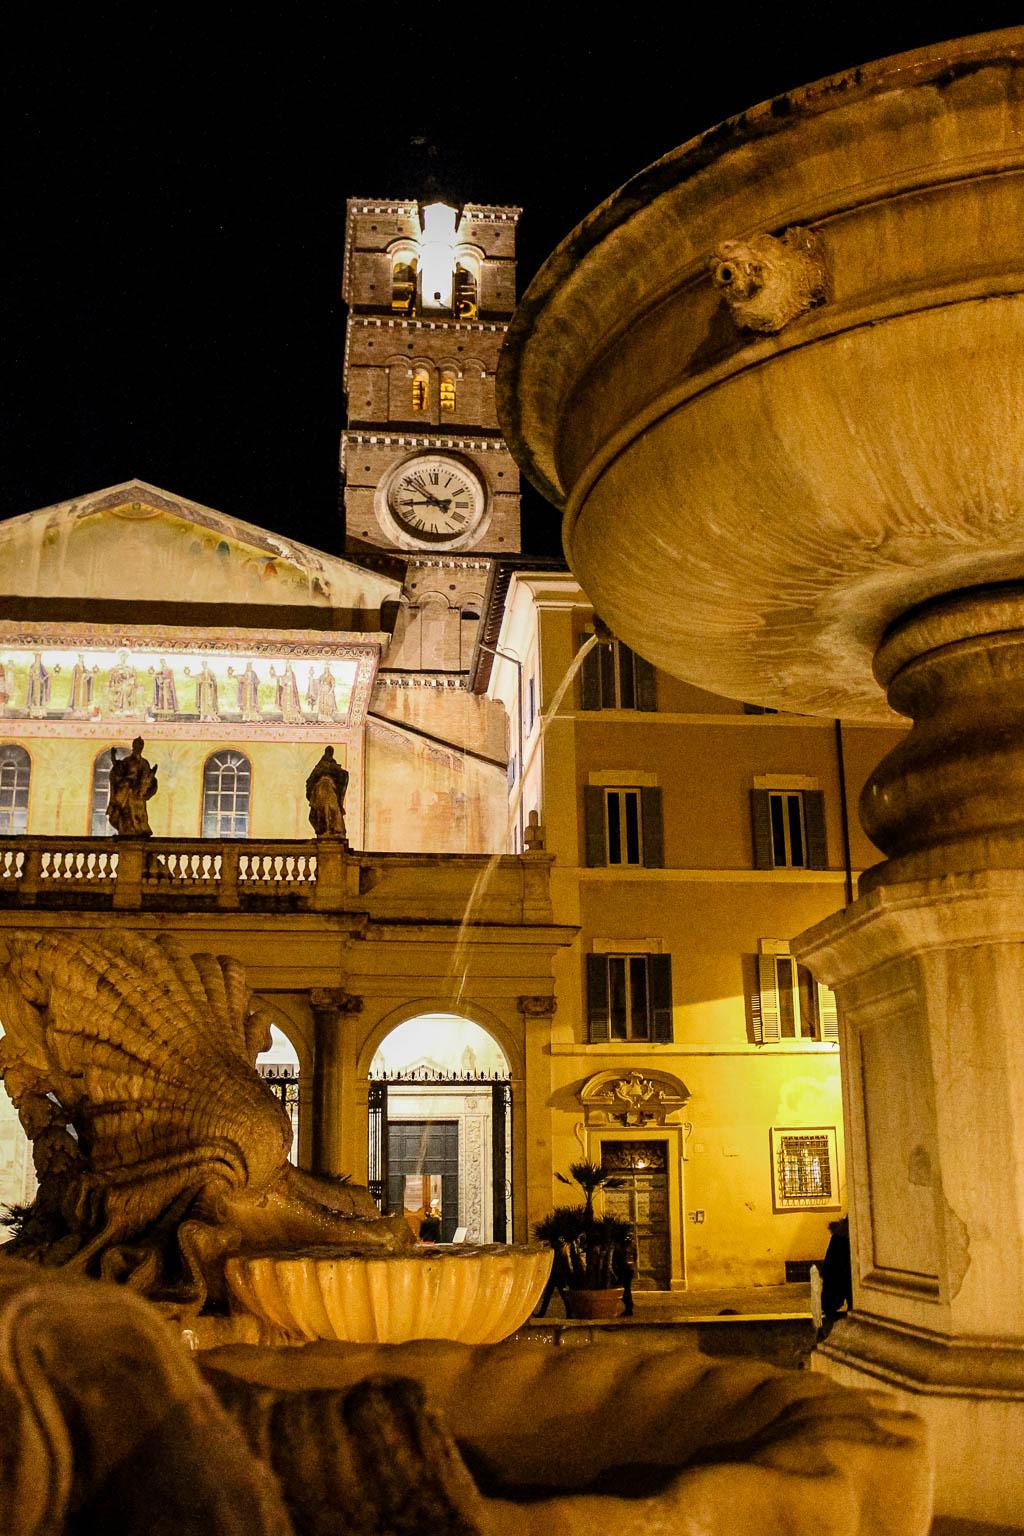 Fontana die Santa Maria Trastevere bei Nacht: Urlaub in Rom